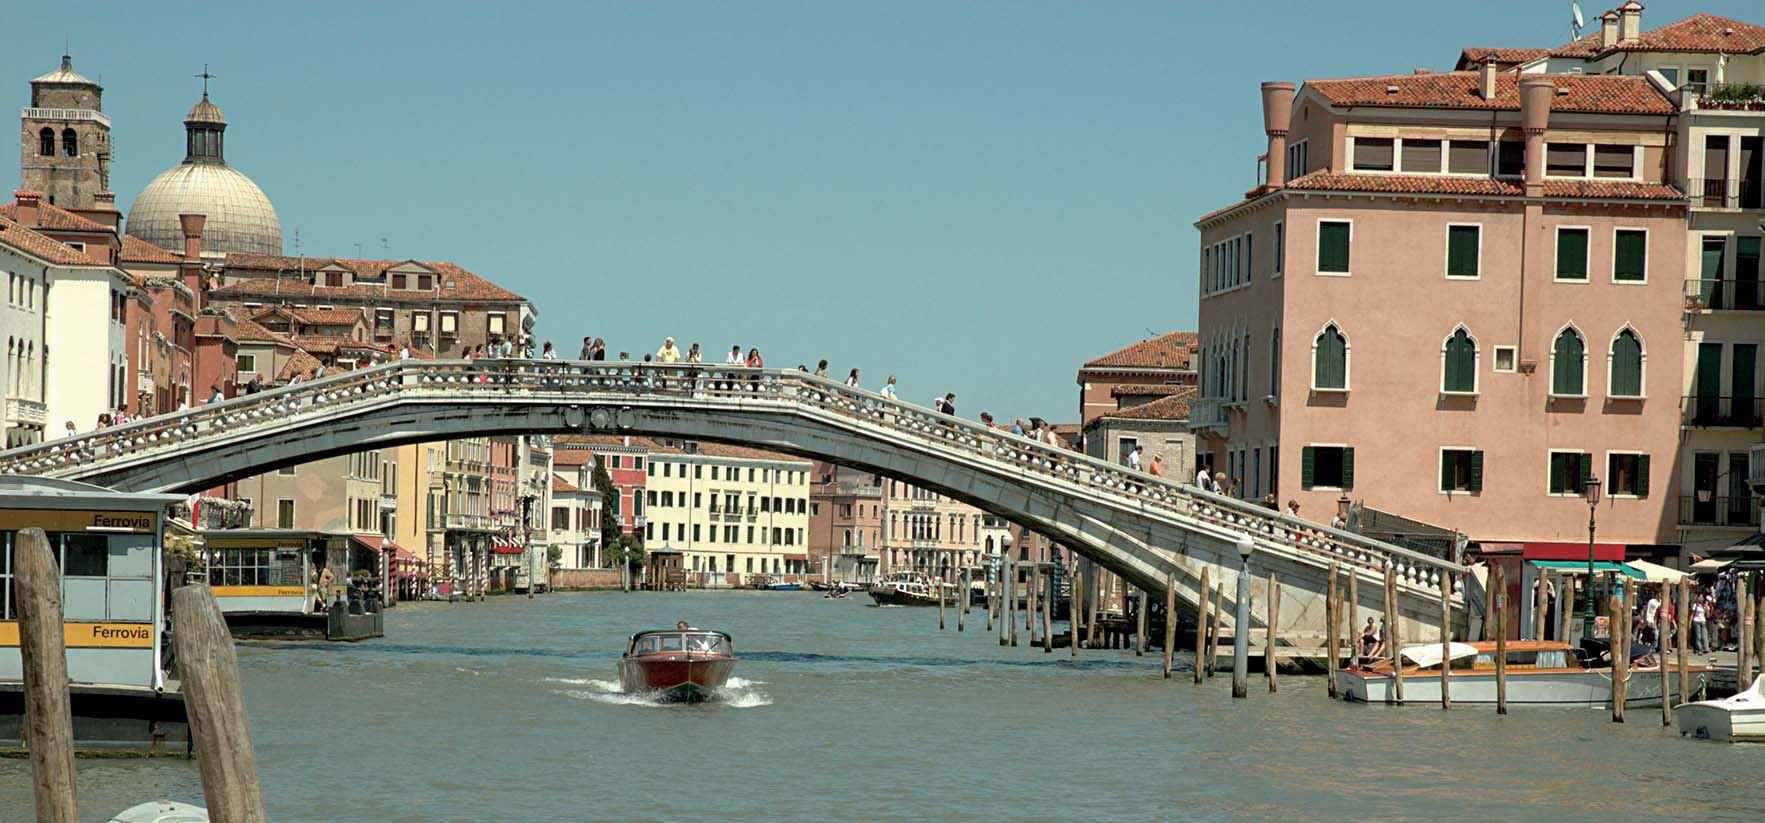 Venezia ponte degli scalzi